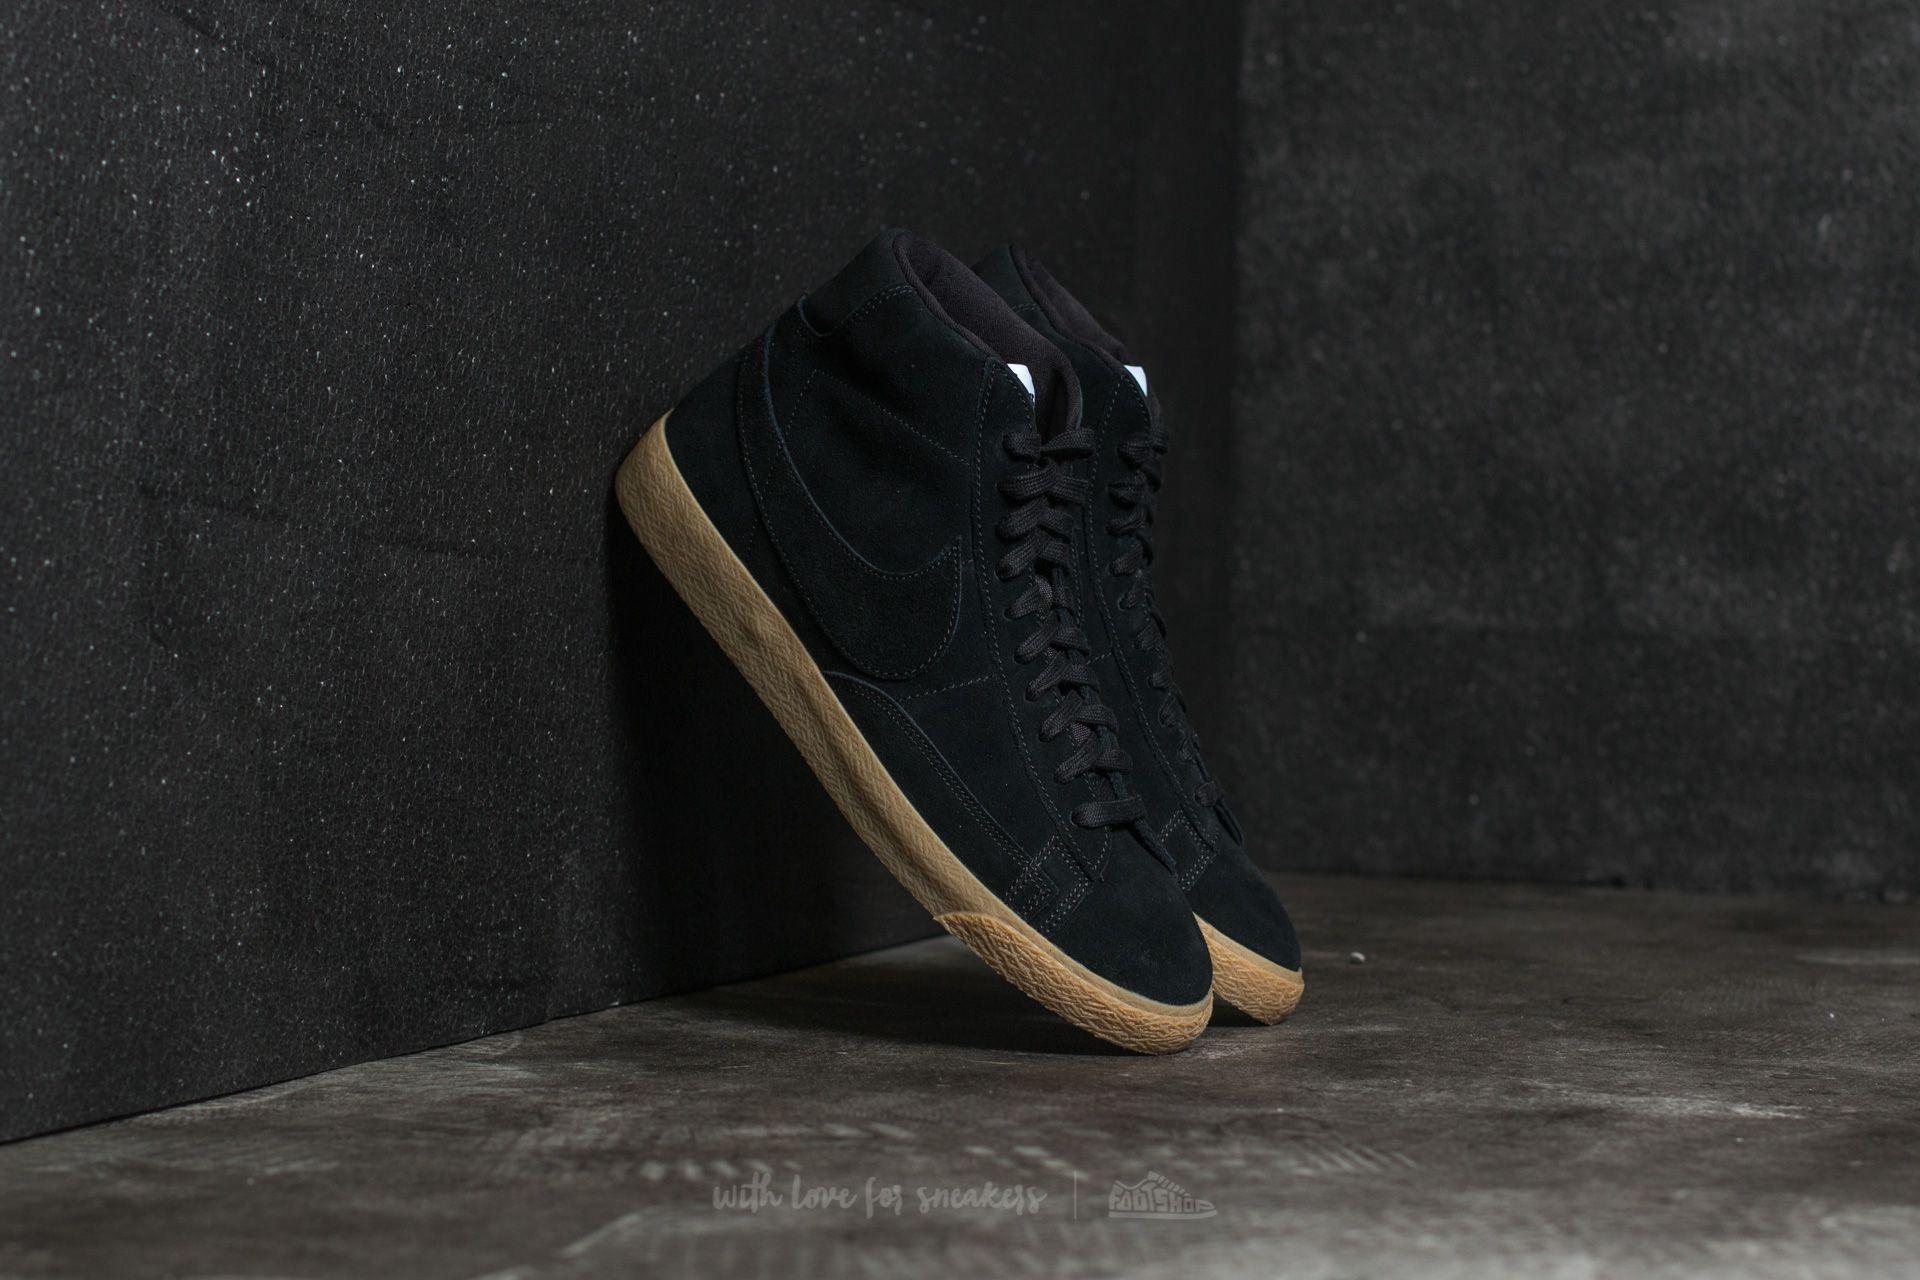 barro Gracias Marchitar  Men's shoes Nike Blazer Mid Premium Black/ Black-Gum Light Brown   Footshop